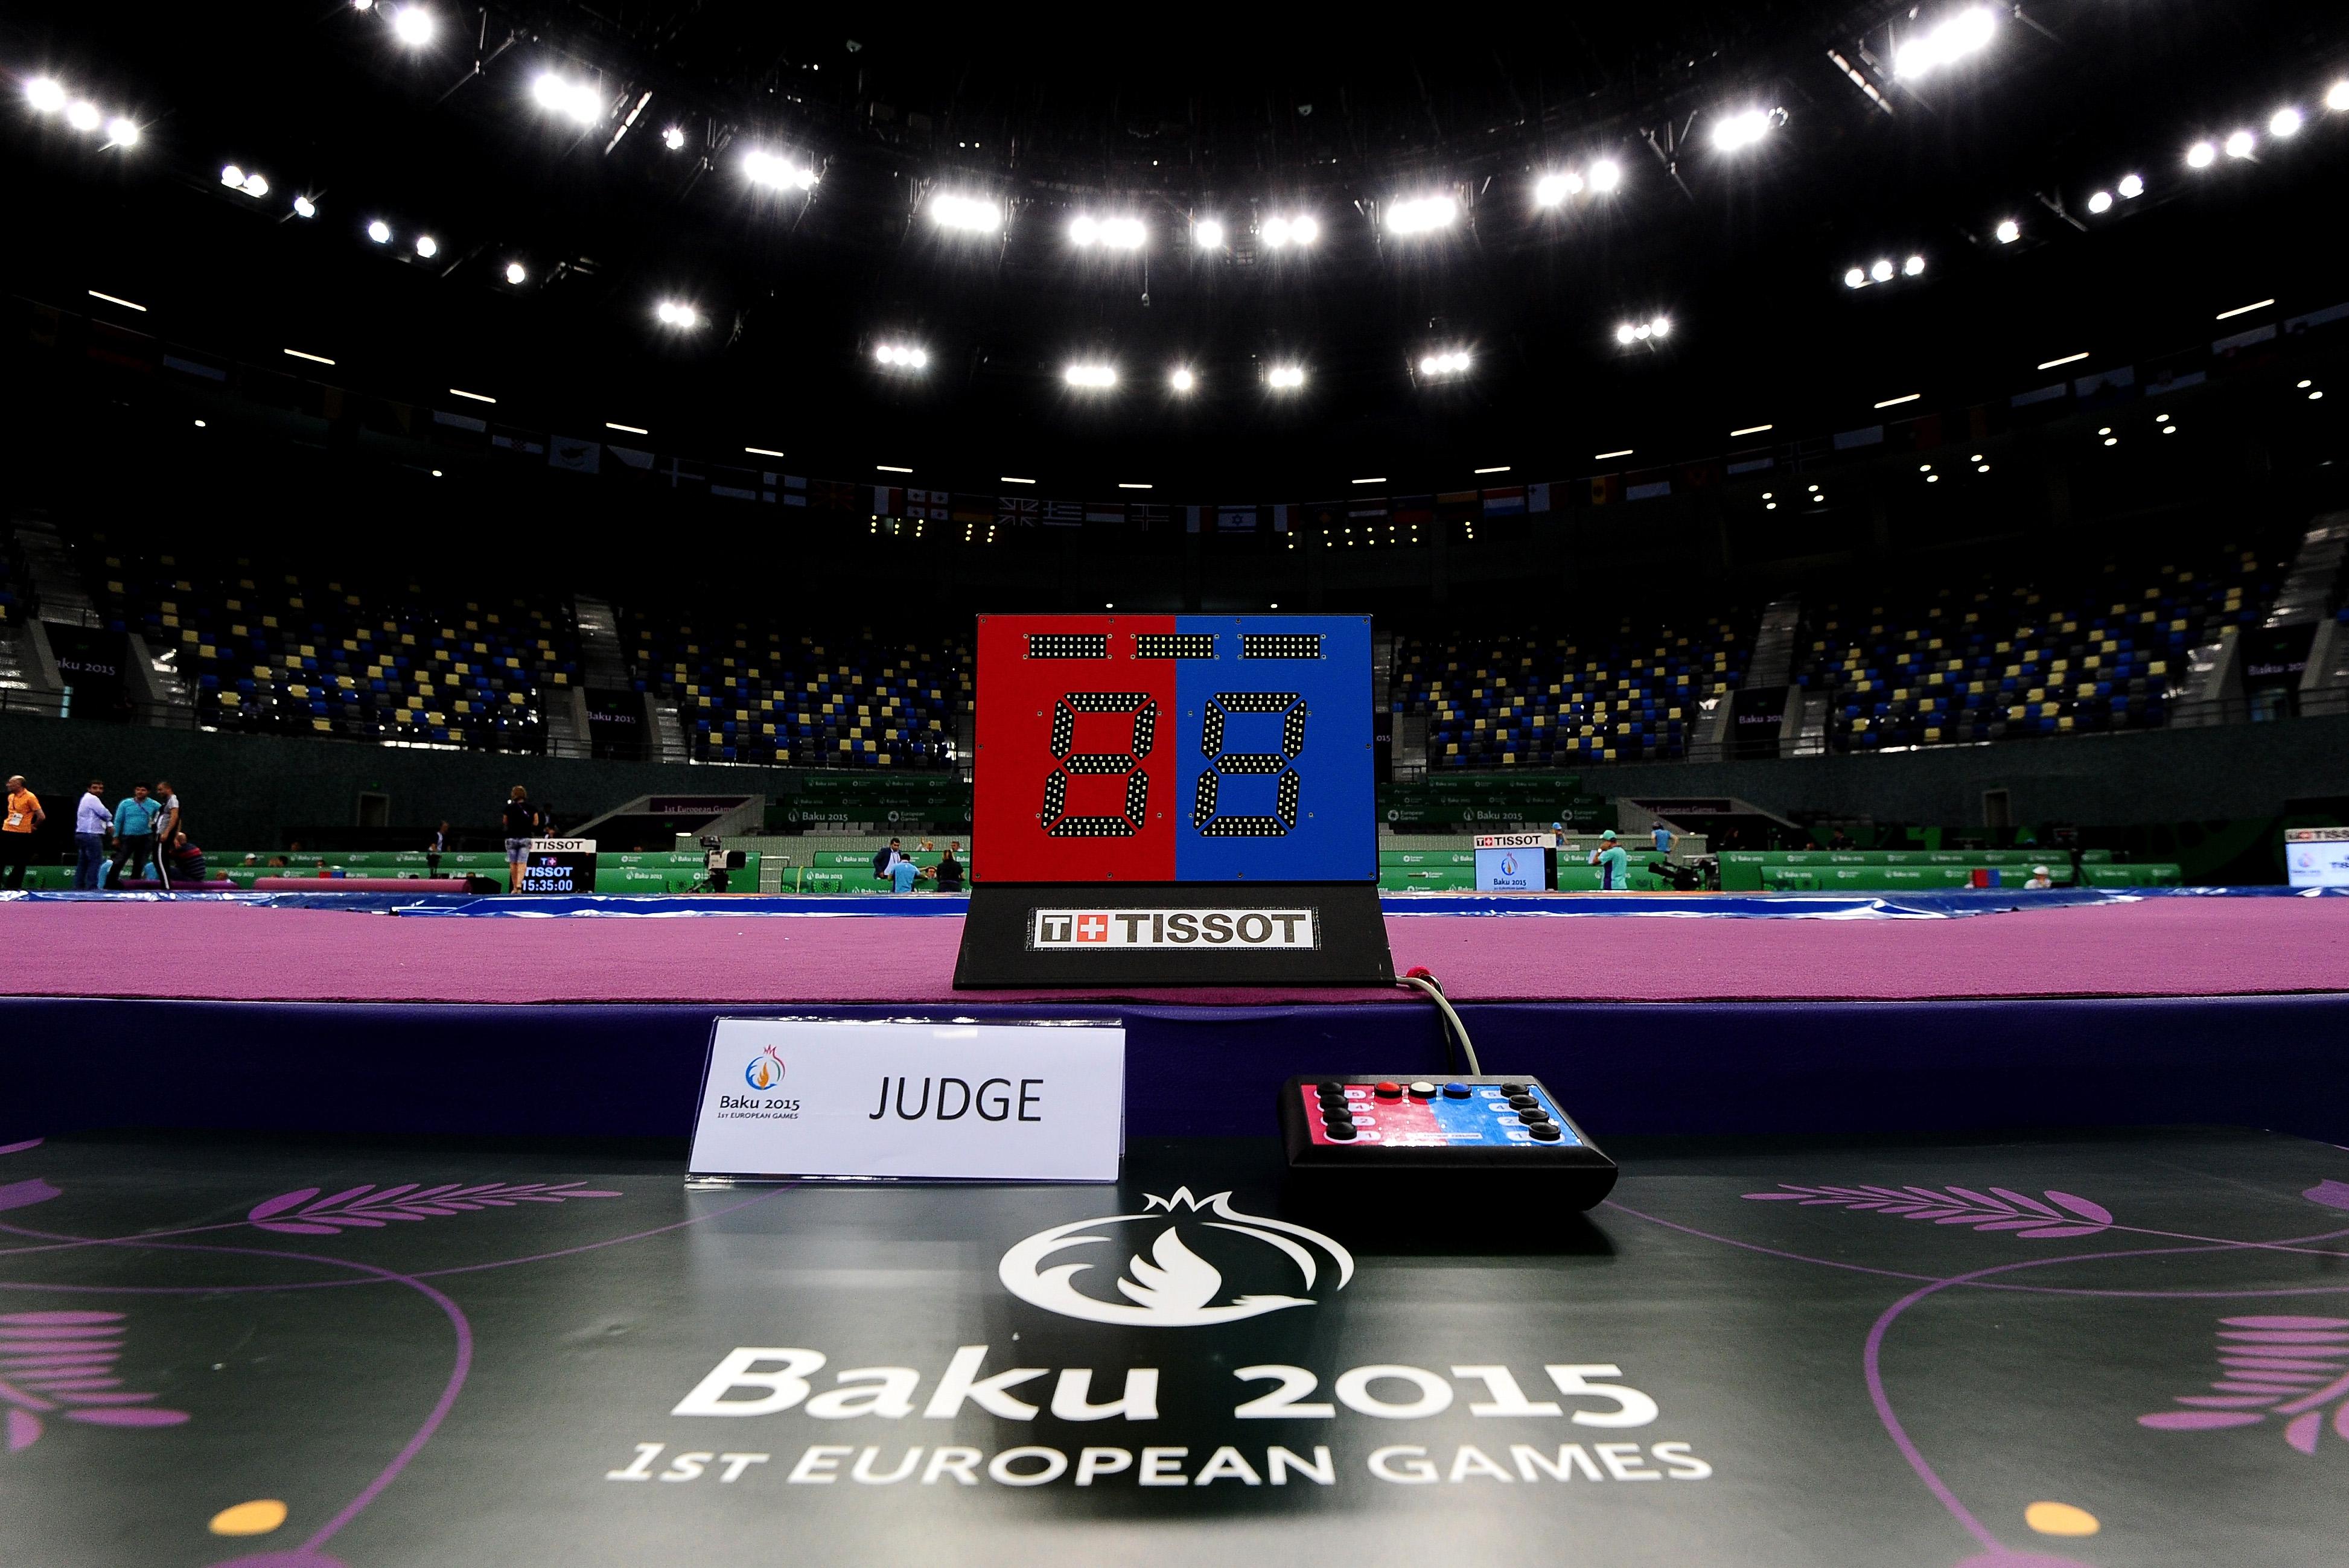 ahead of Baku 2015, the first European Games on June 11, 2015 in Baku, Azerbaijan.